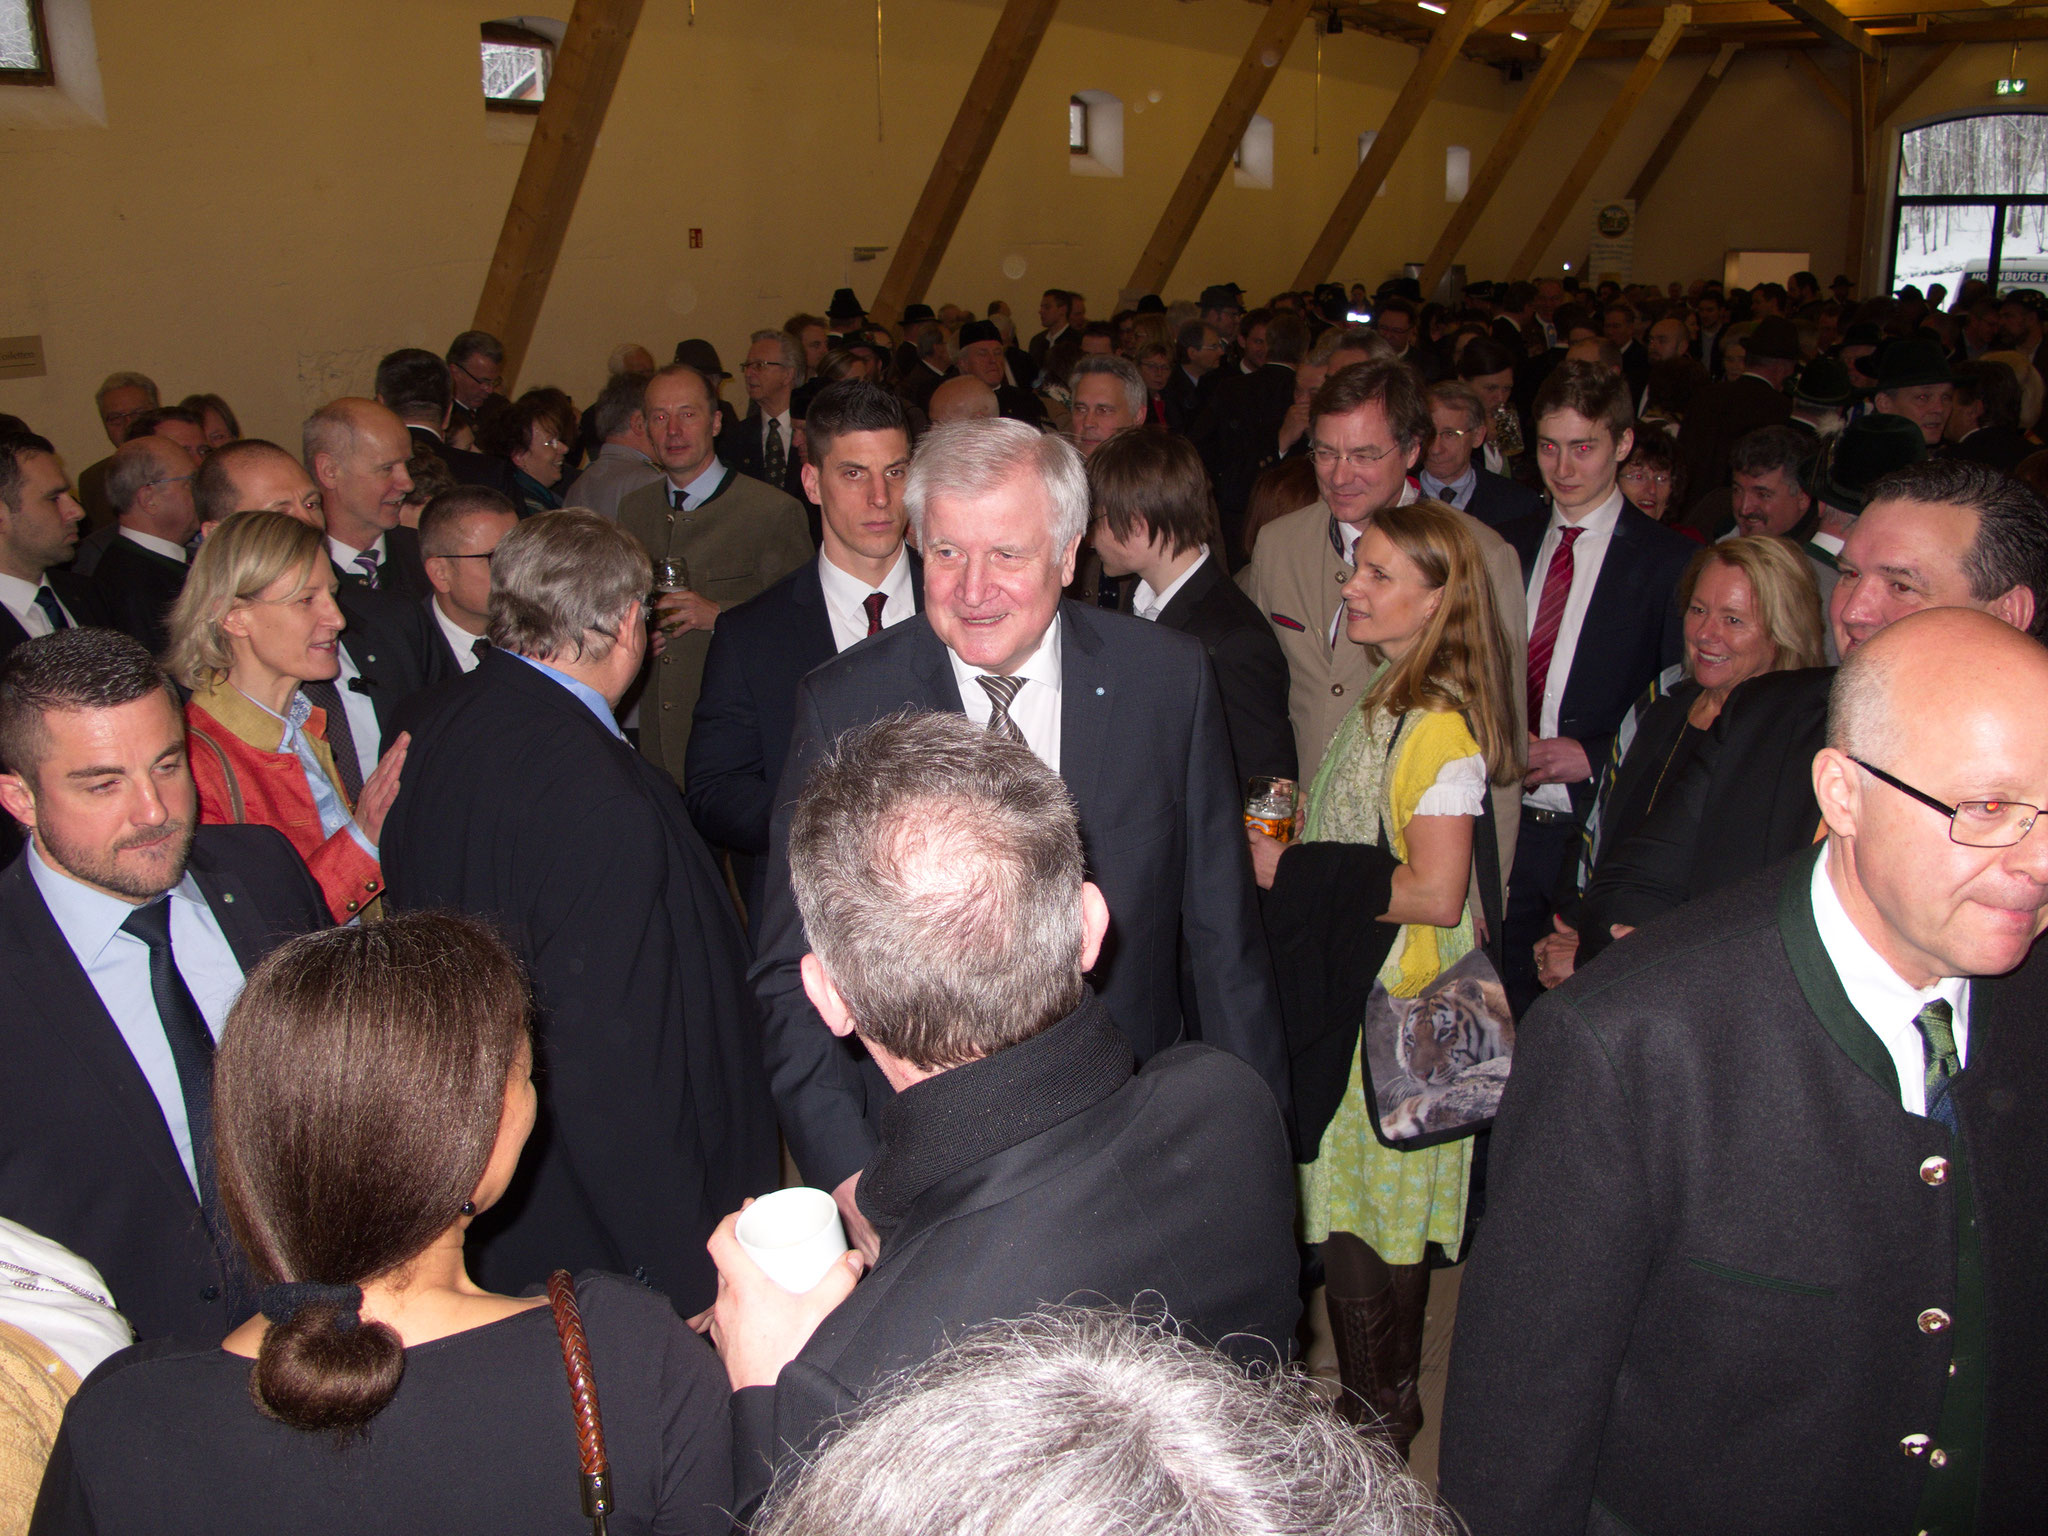 Ministerpräsident Horst Seehofer wird begrüßt ...